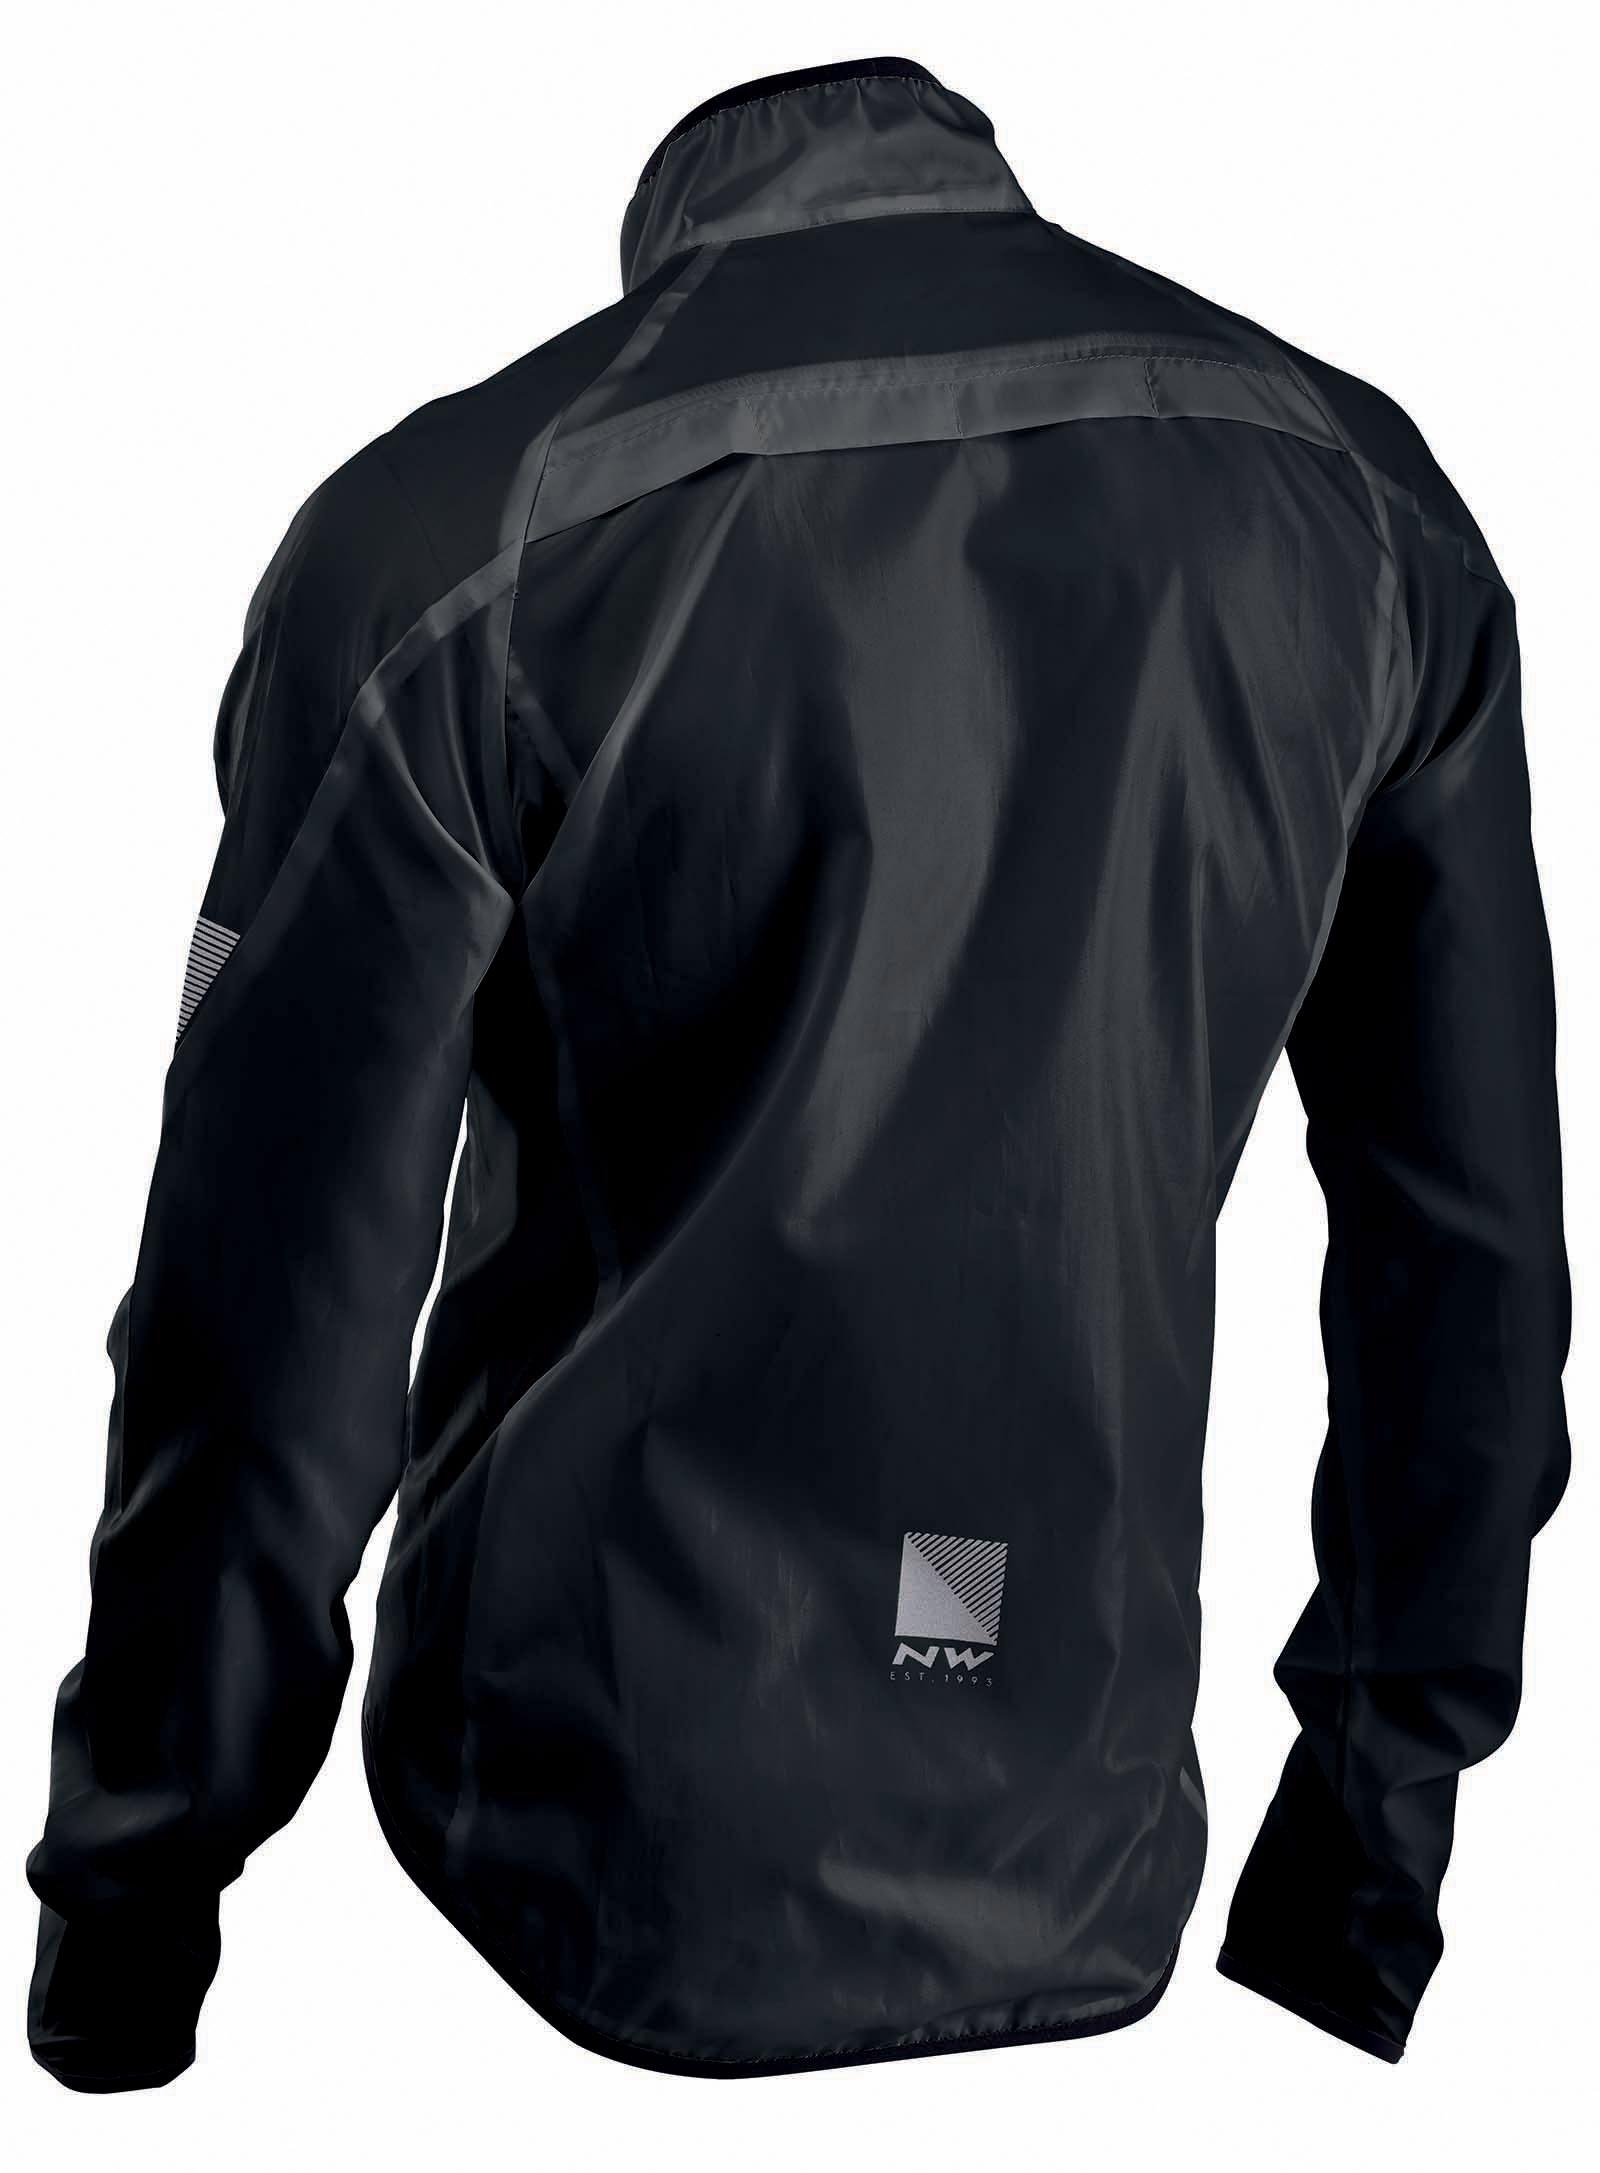 Buy Man Cycling Jacket Vortex Black 17619171   Italy2Us.com